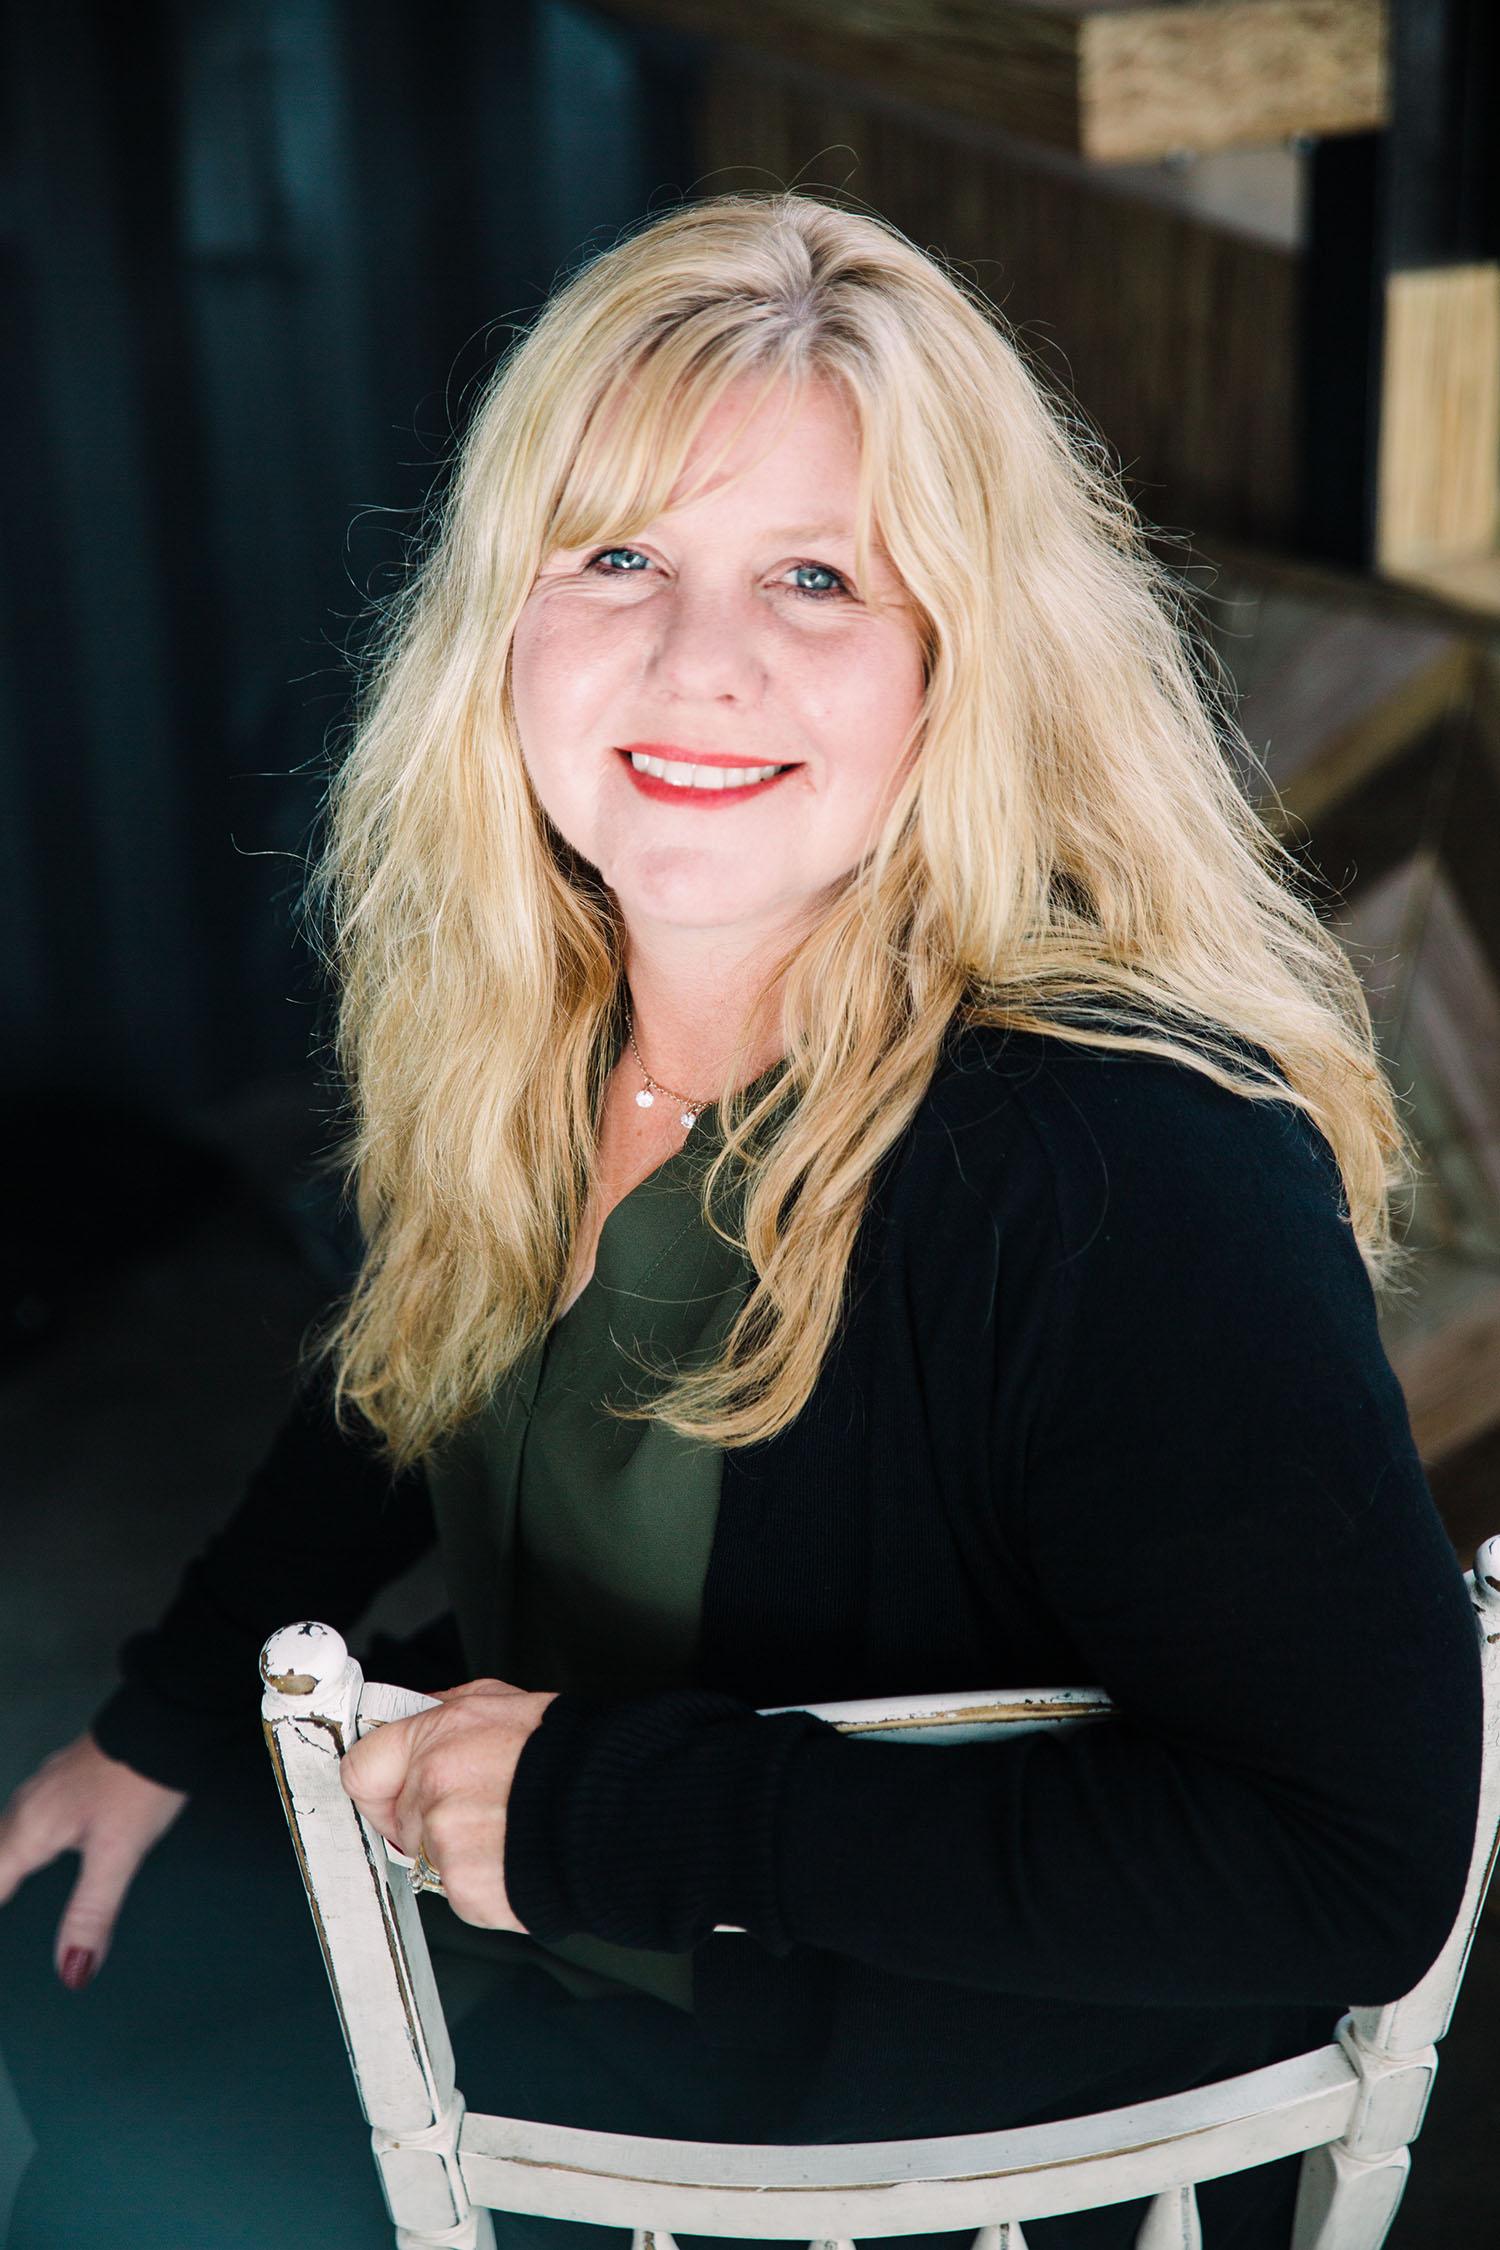 Kim Melton // nutritionproconsulting.com